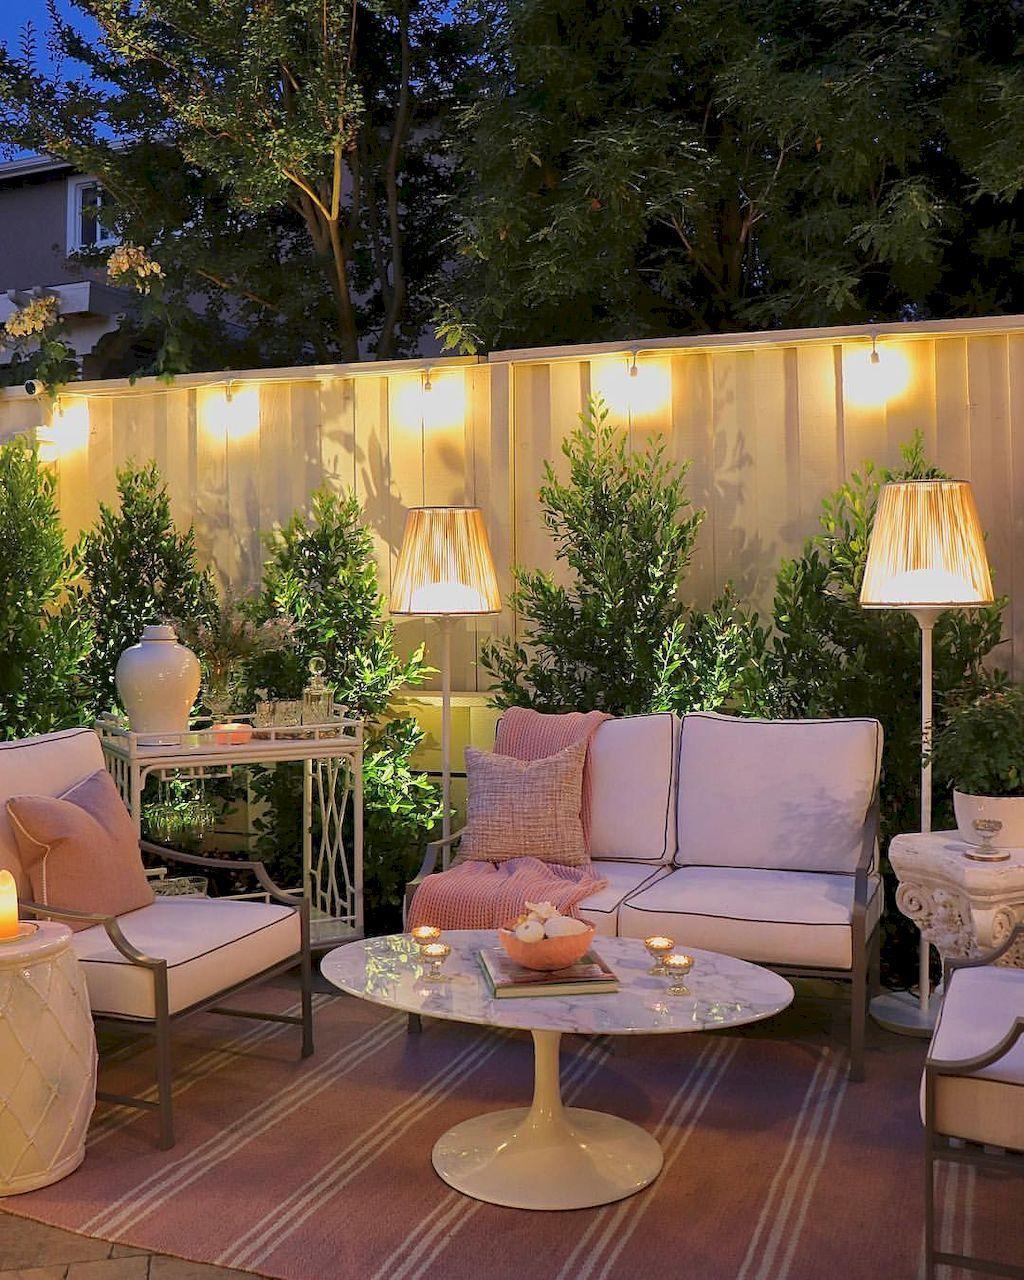 75 Amazing Backyard Patio Ideas for Summer #backyardpatiodesigns